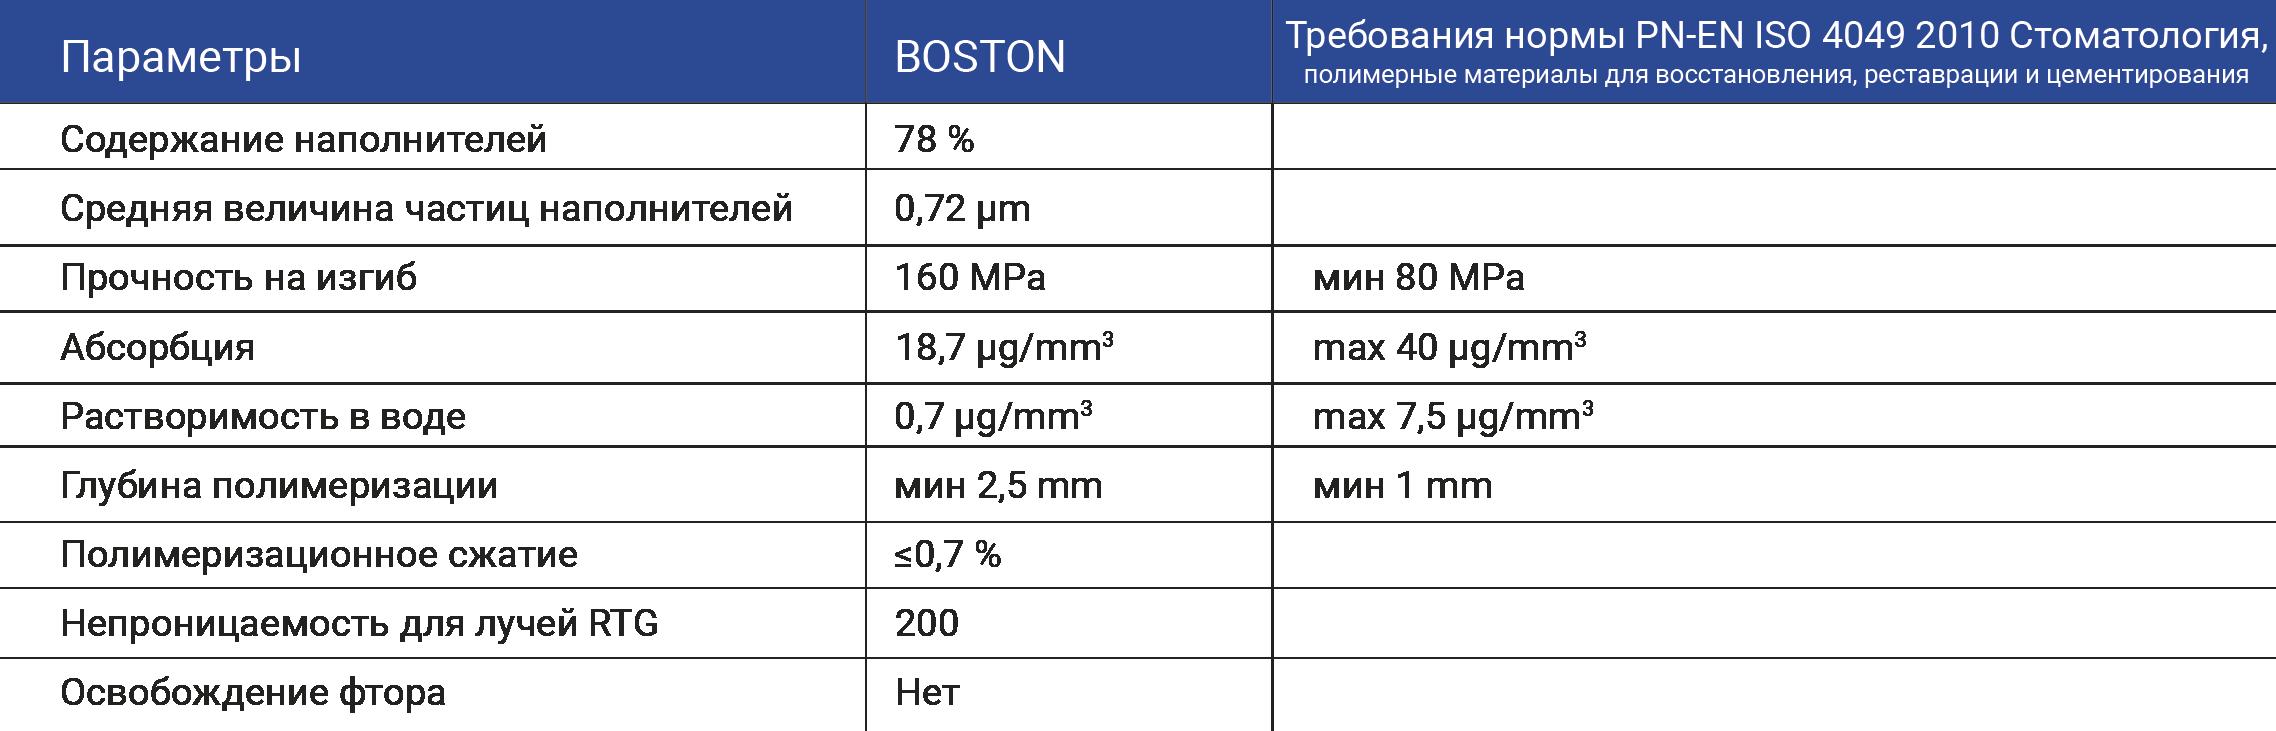 tabelka-boston